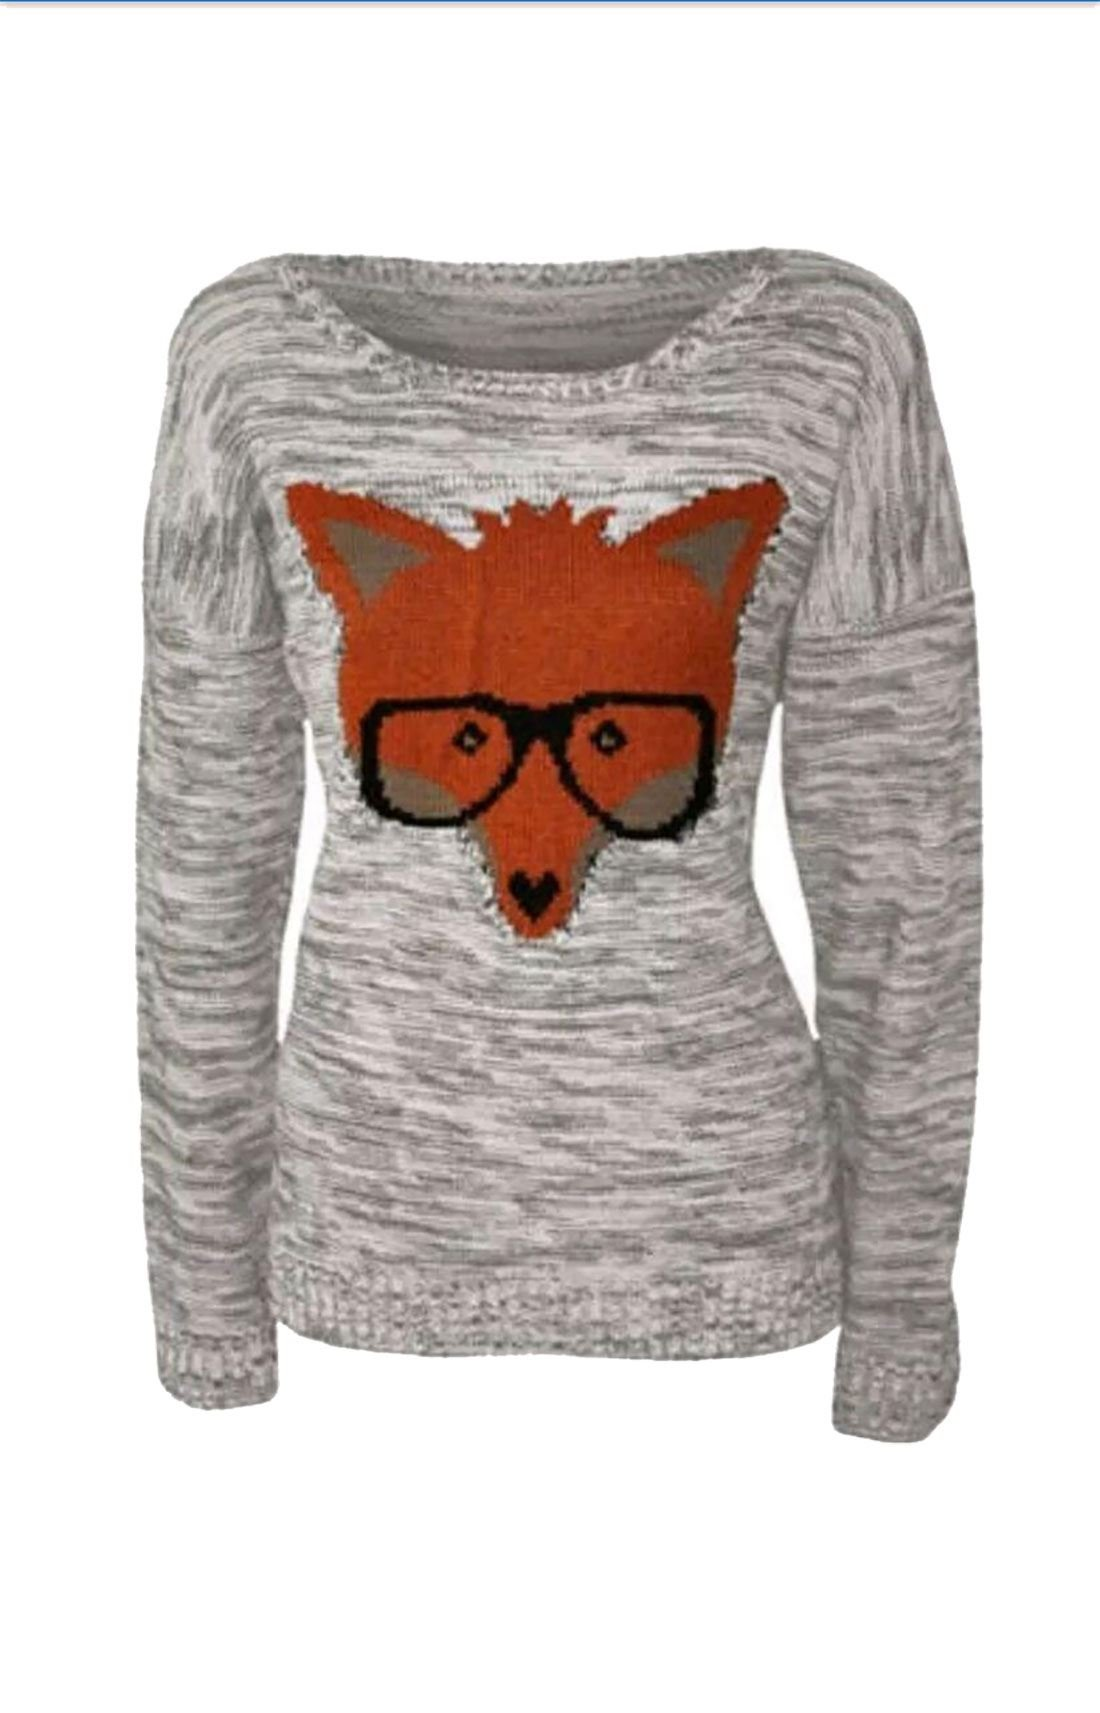 Rimi Hanger Womens Animal Fox Glasses Print Knitted Jumper Ladies Long Sleeve Sweater Top Grey Medium